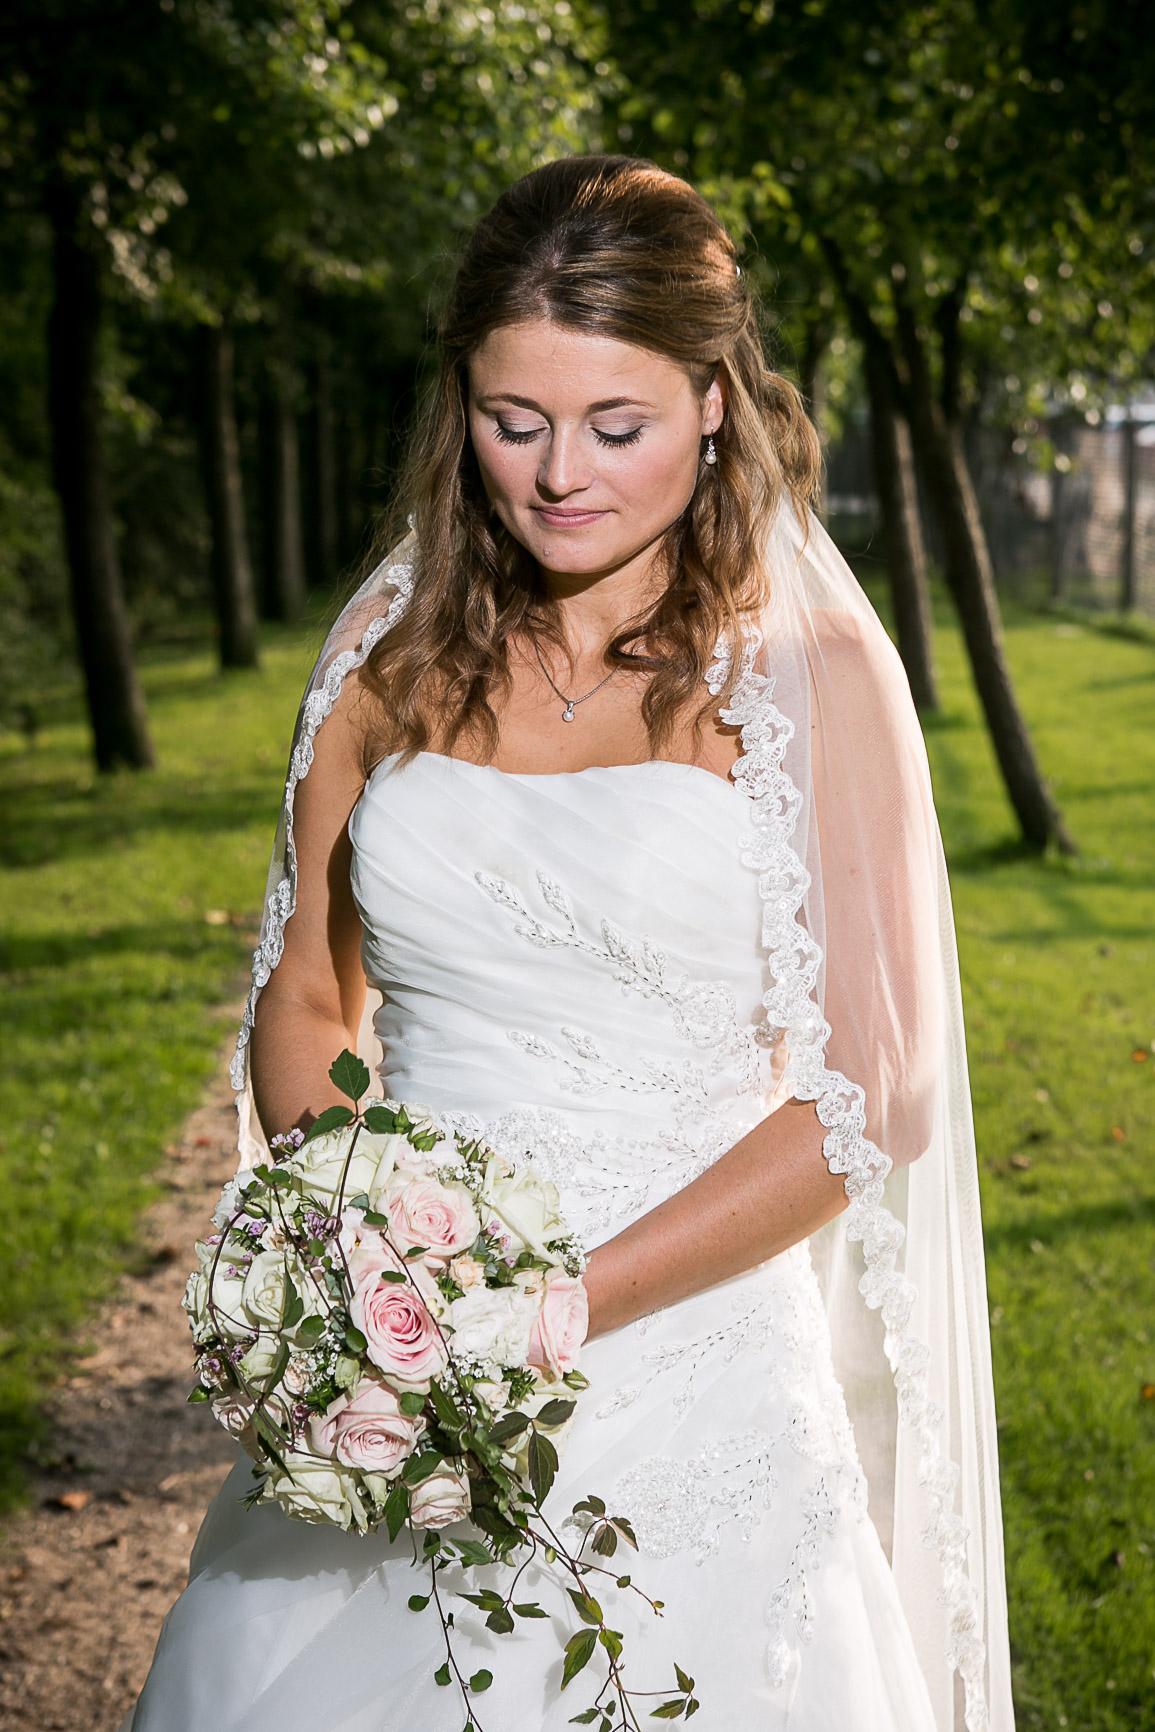 20140923-bryllup-lille-2844.jpg